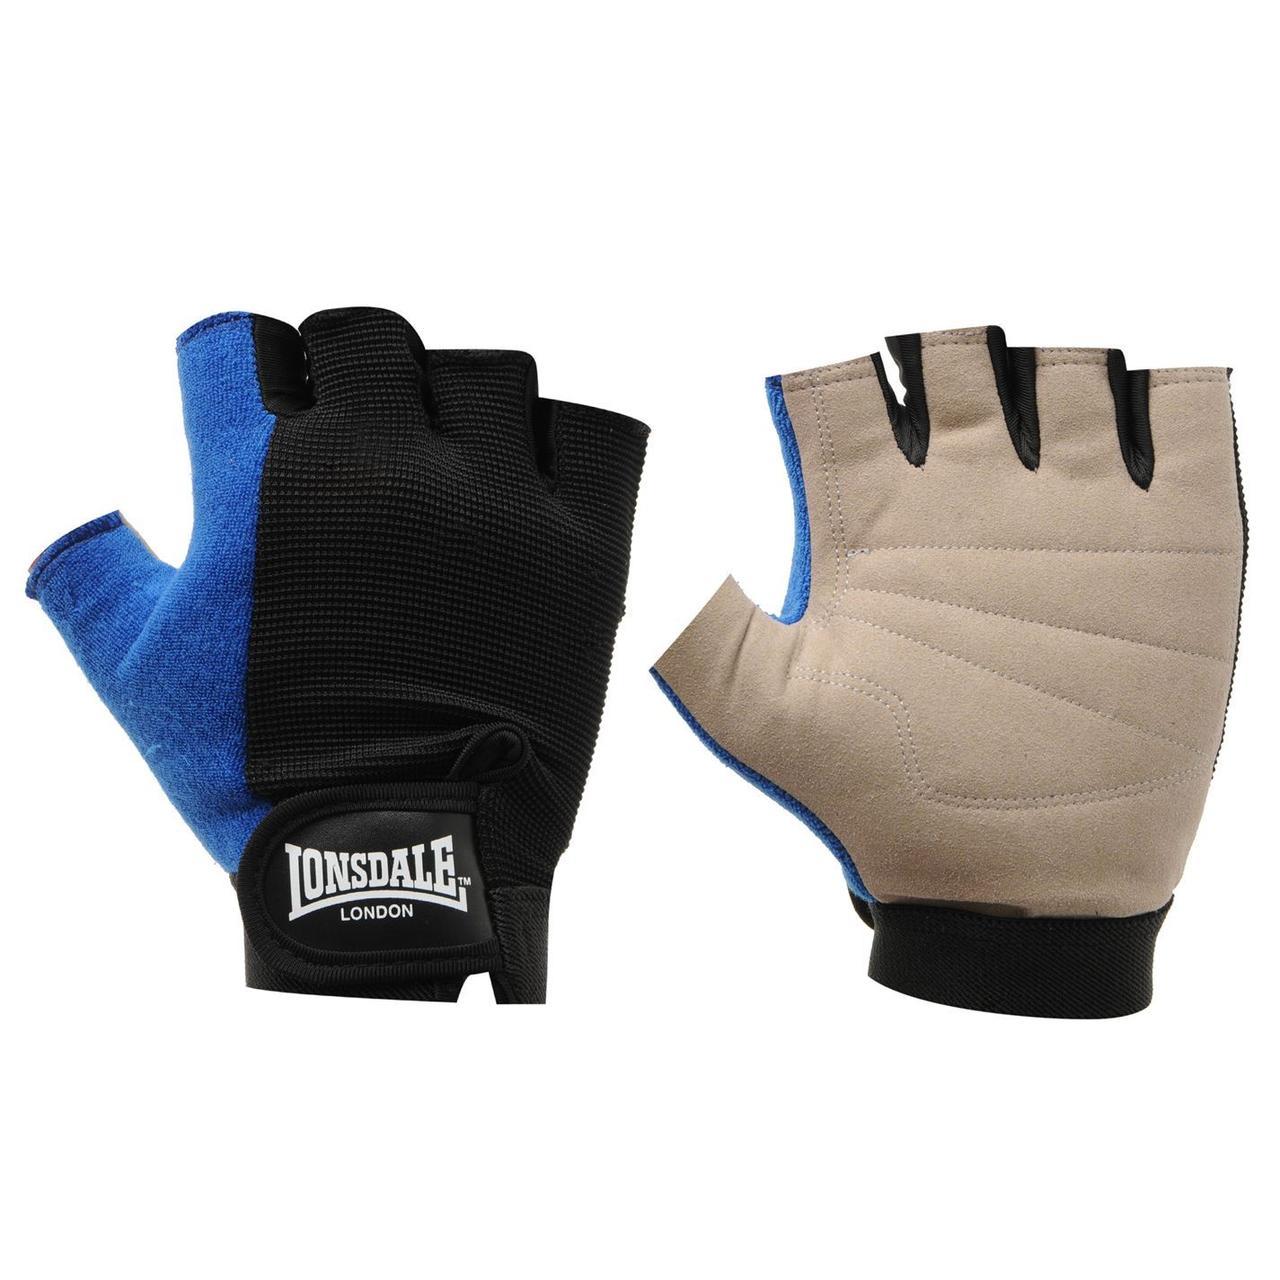 Lonsdale Перчатки для тренажерного зала Lonsdale Fitness Gloves